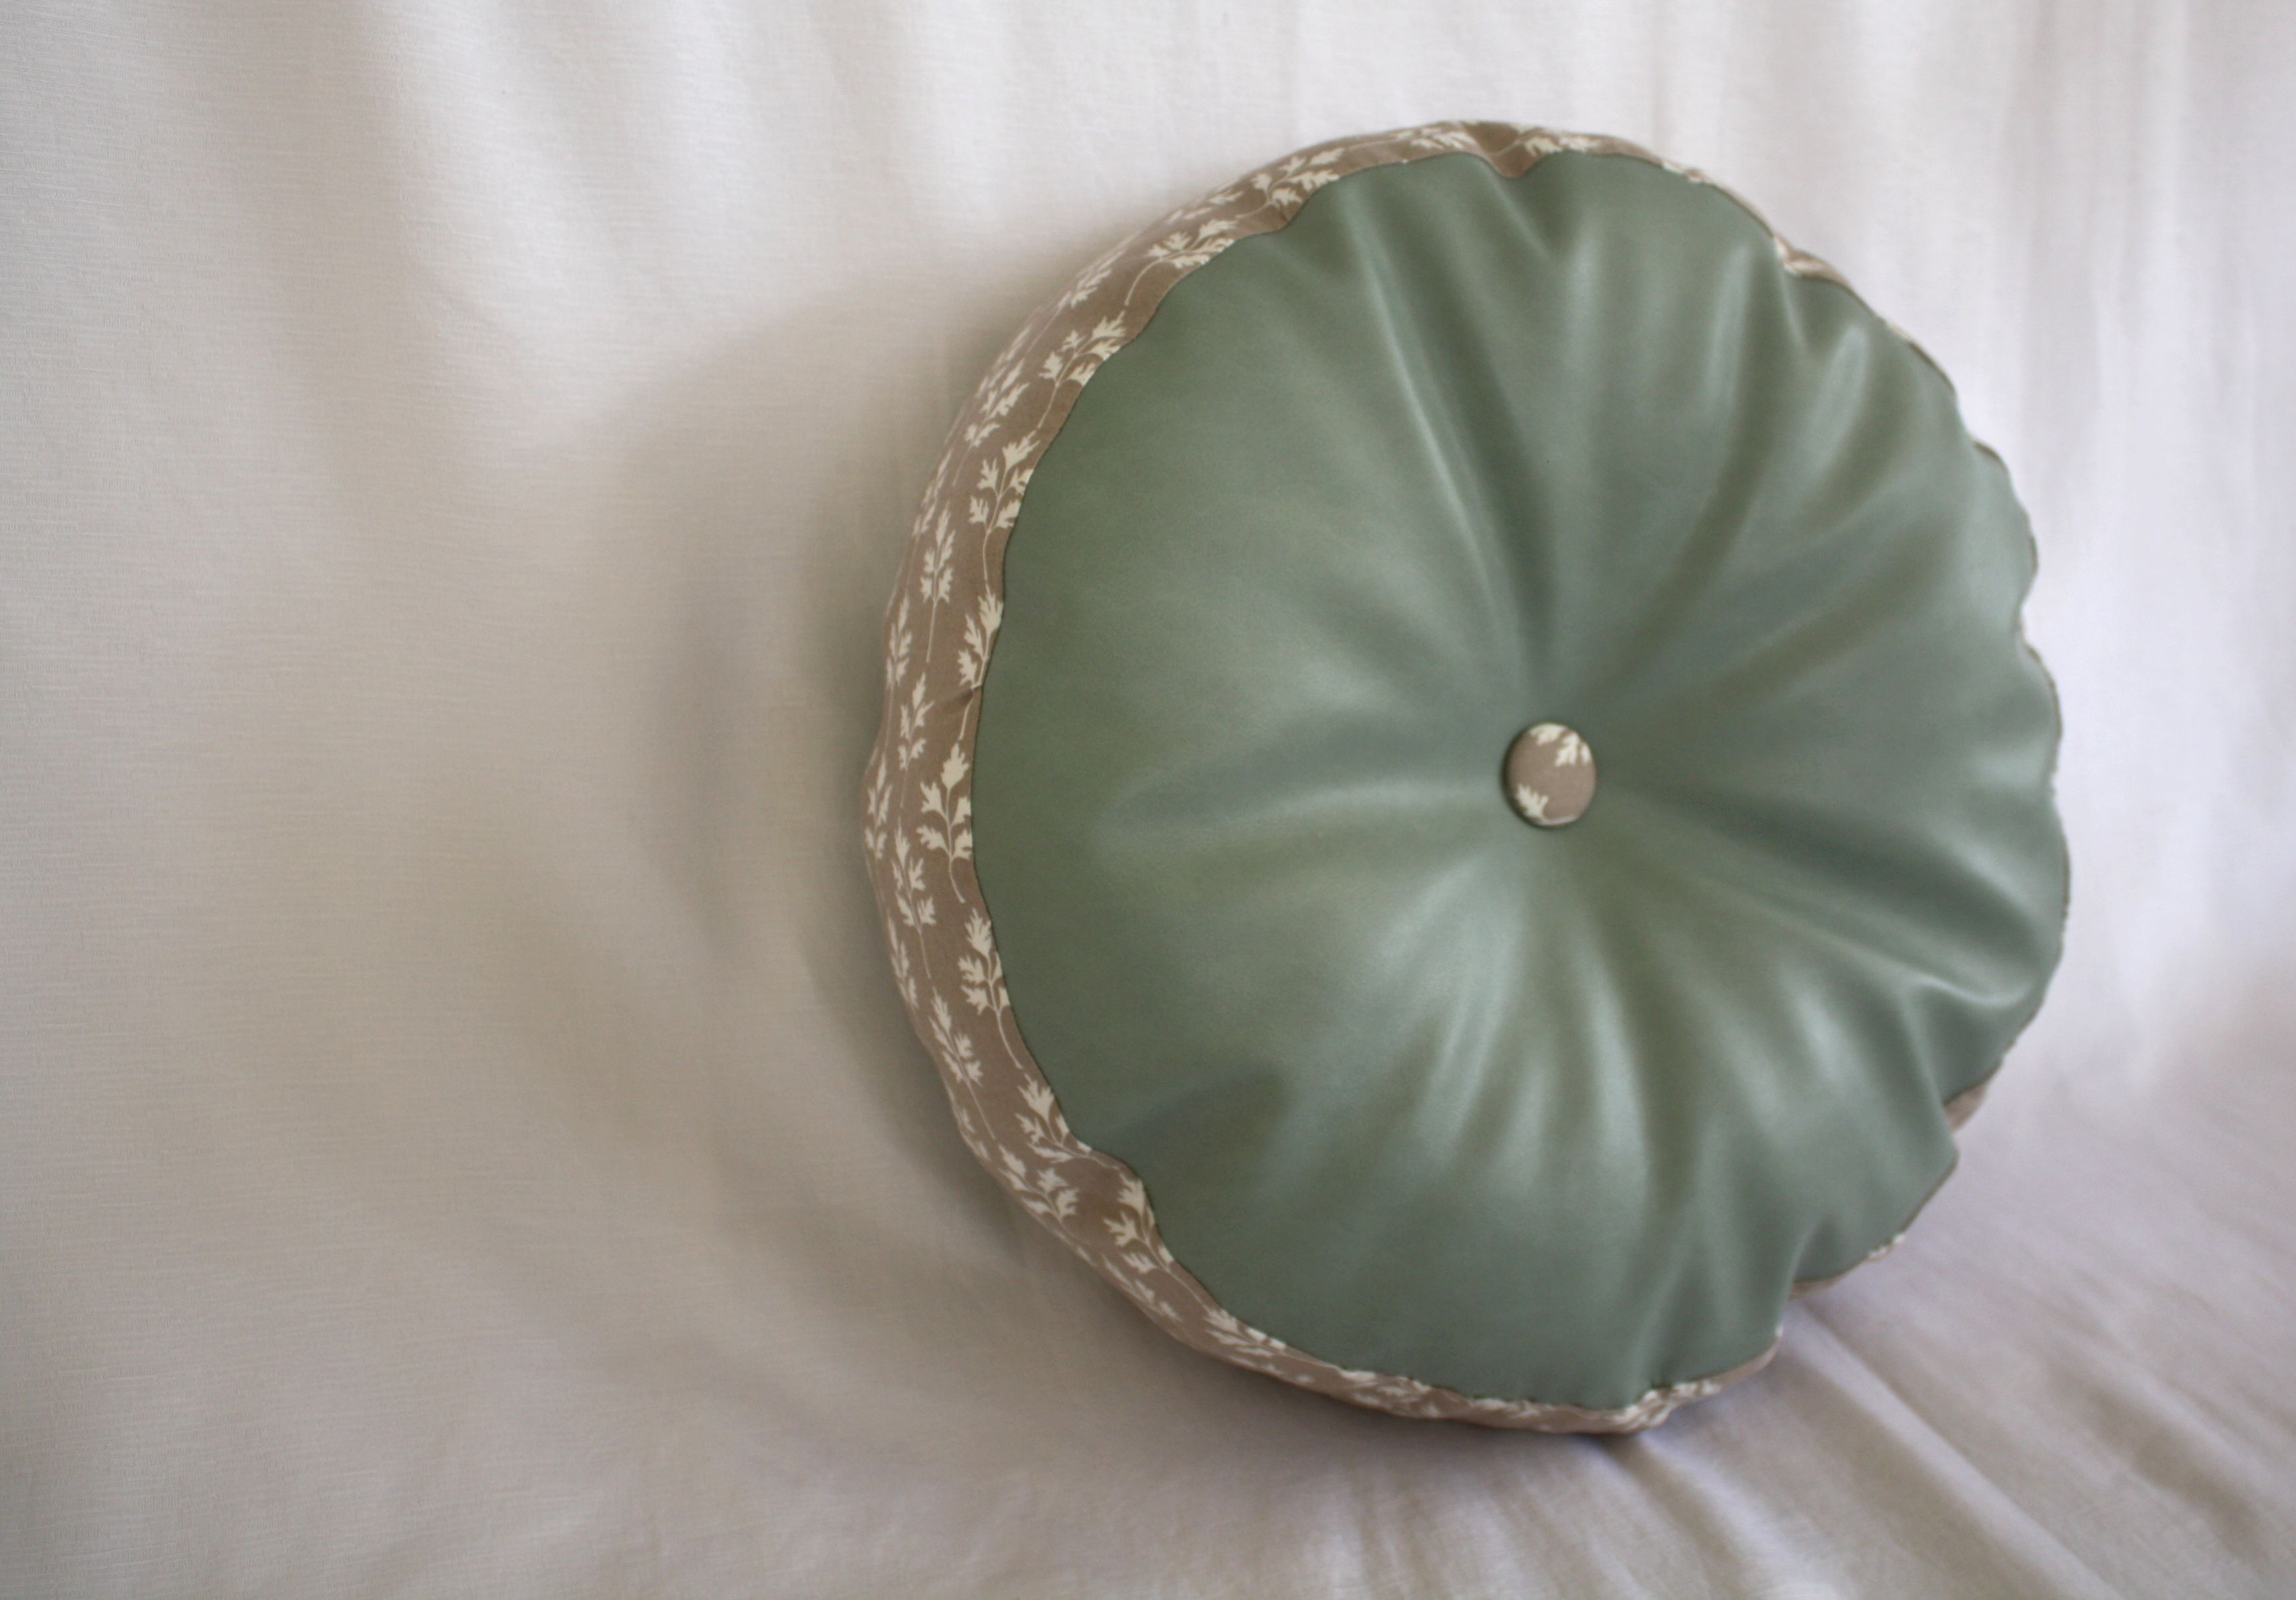 Round Pillow - Light Blue/Brown Leaf Decorative Pillow, Button Accent